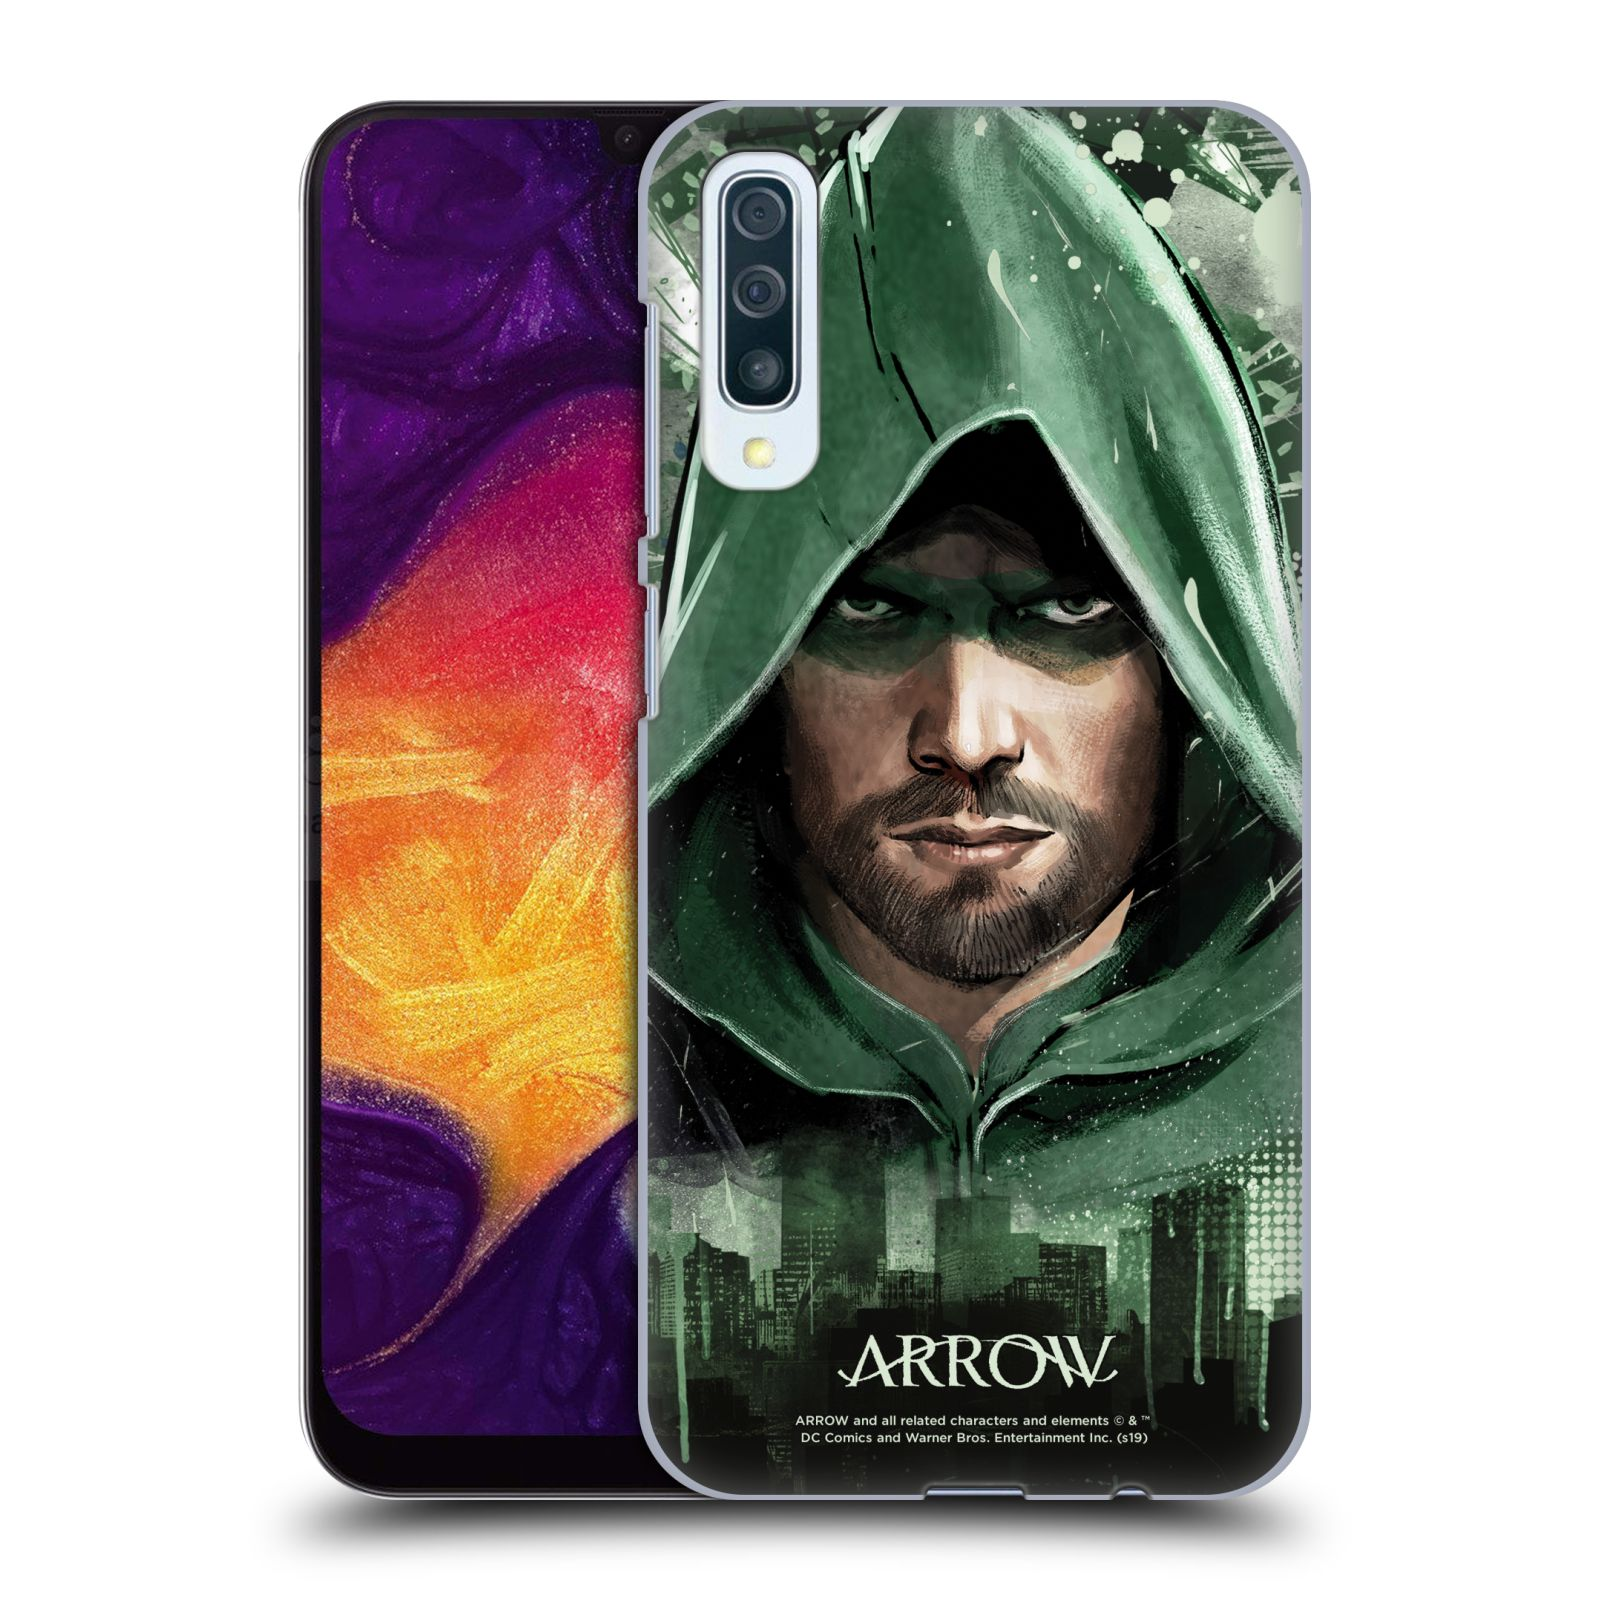 Pouzdro na mobil Samsung Galaxy A50 - HEAD CASE - Seriál Arrow - kreslený motiv